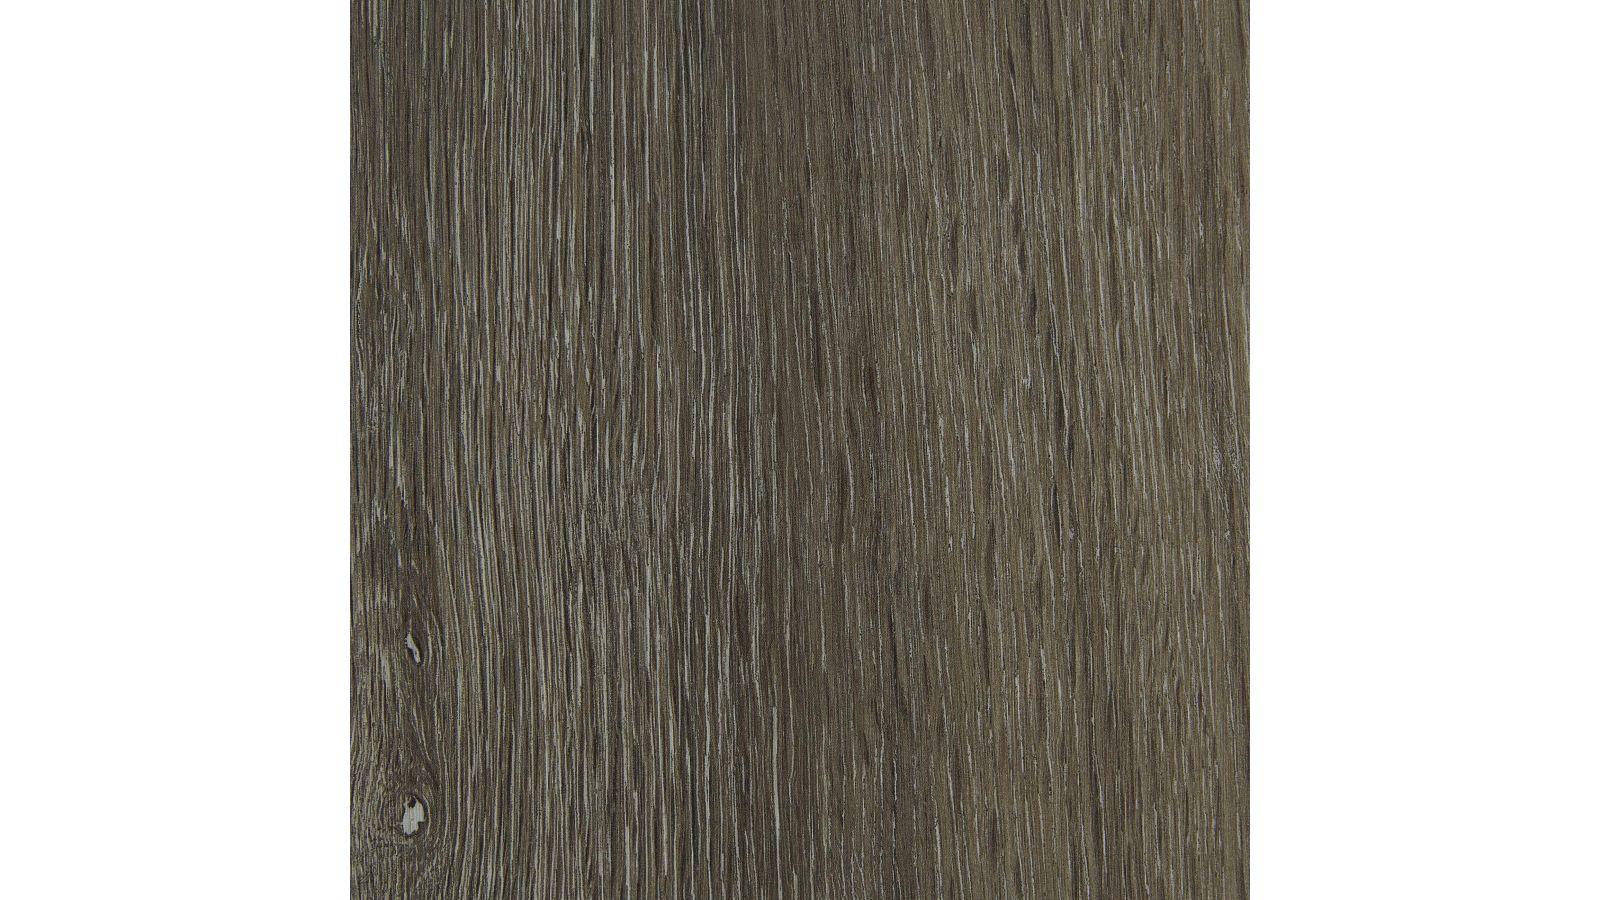 Rustic Wood RW26